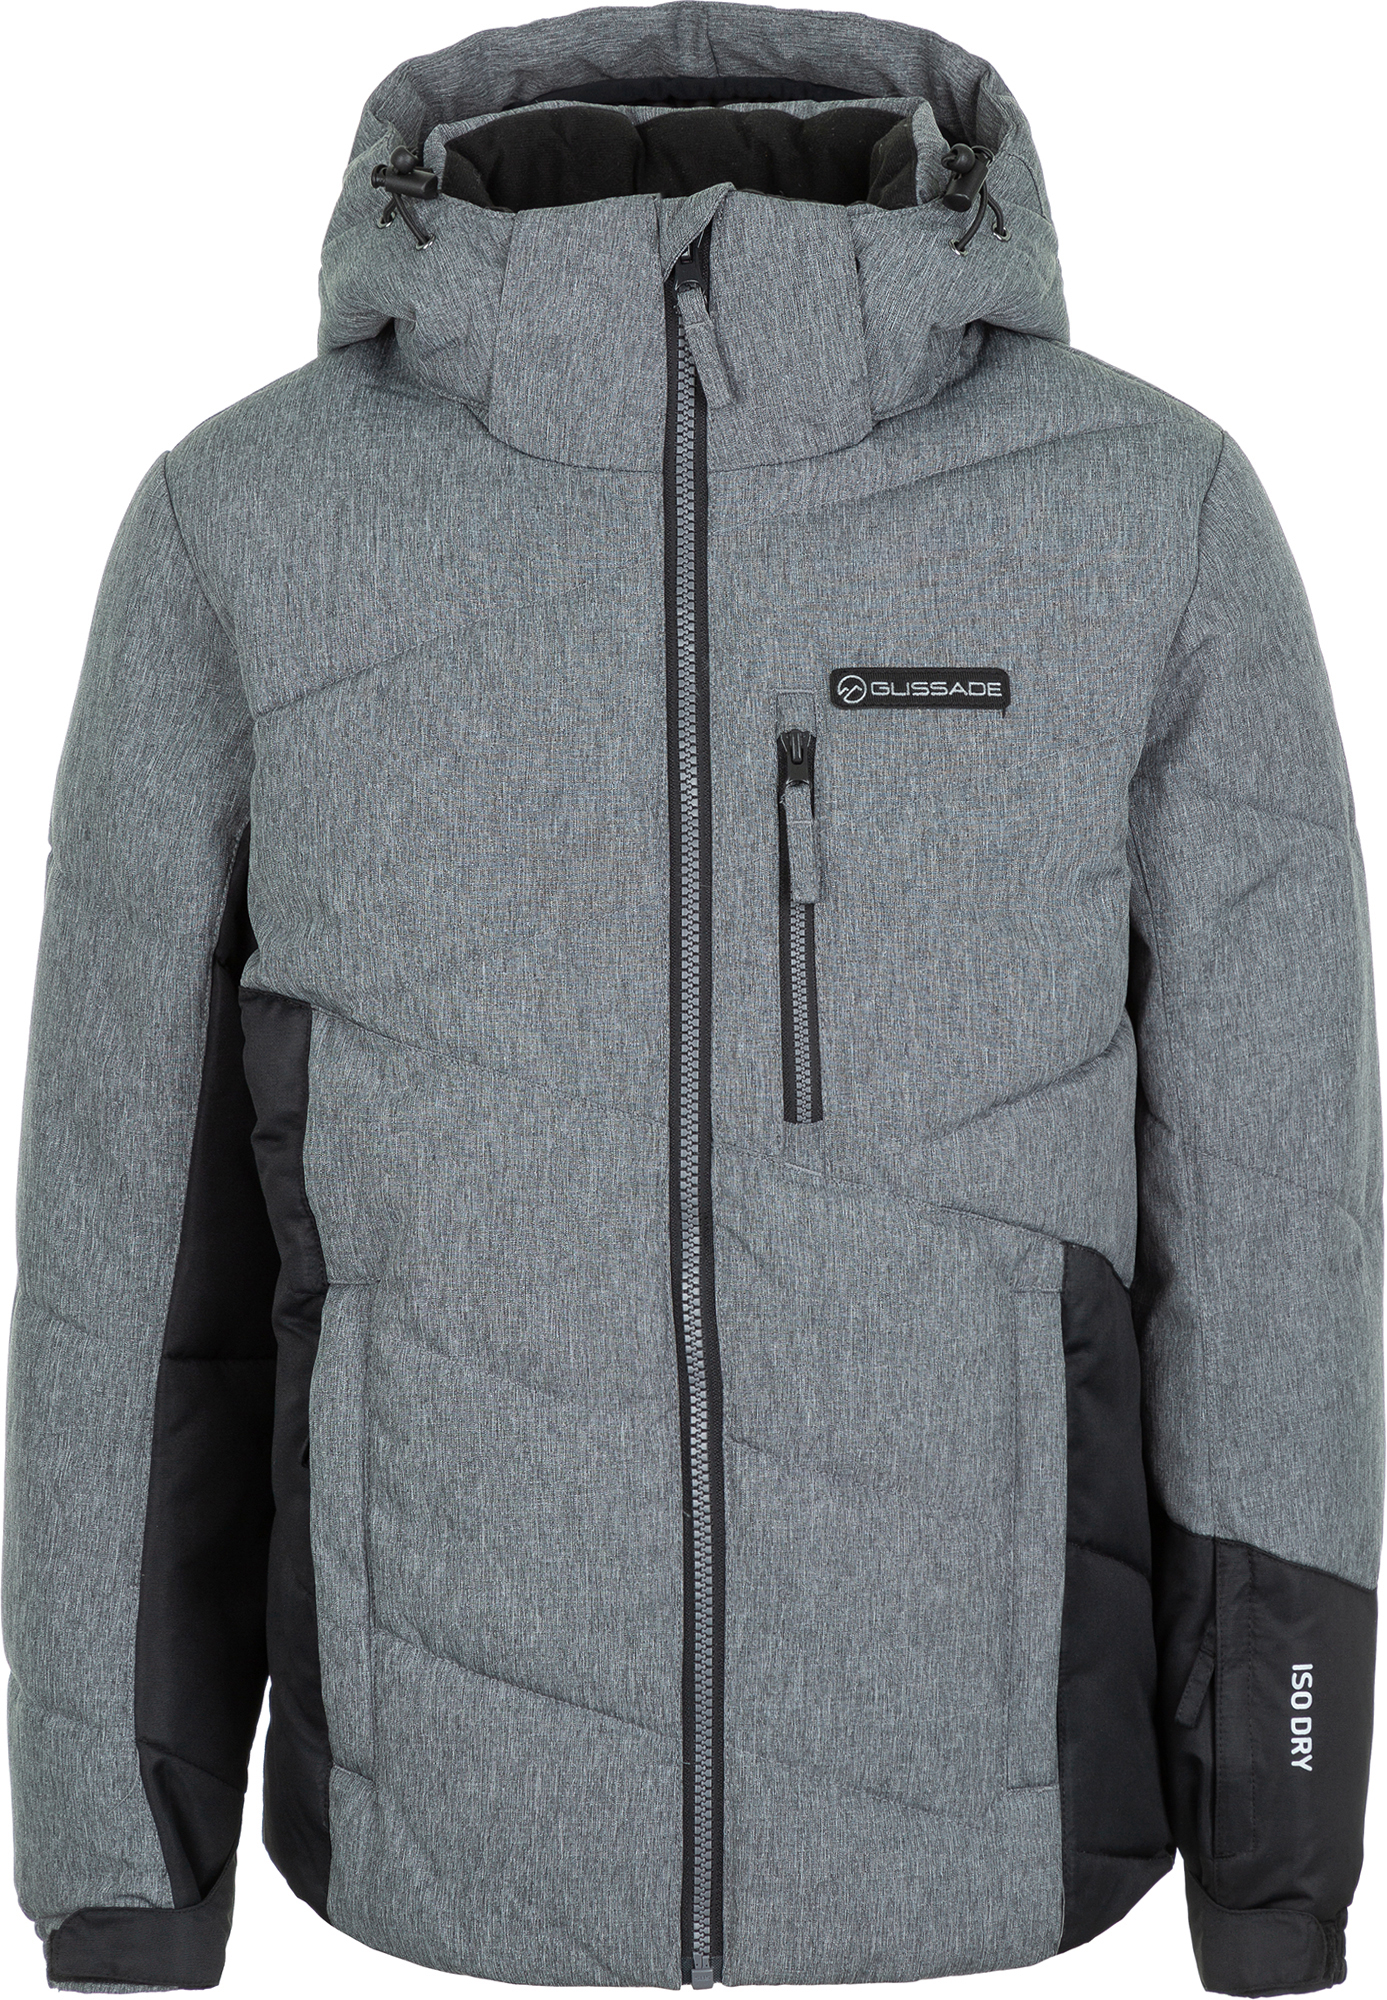 Glissade Куртка утепленная для мальчиков Glissade, размер 170 куртка для мальчика acoola brandon цвет темно серый 20110130145 2000 размер 170